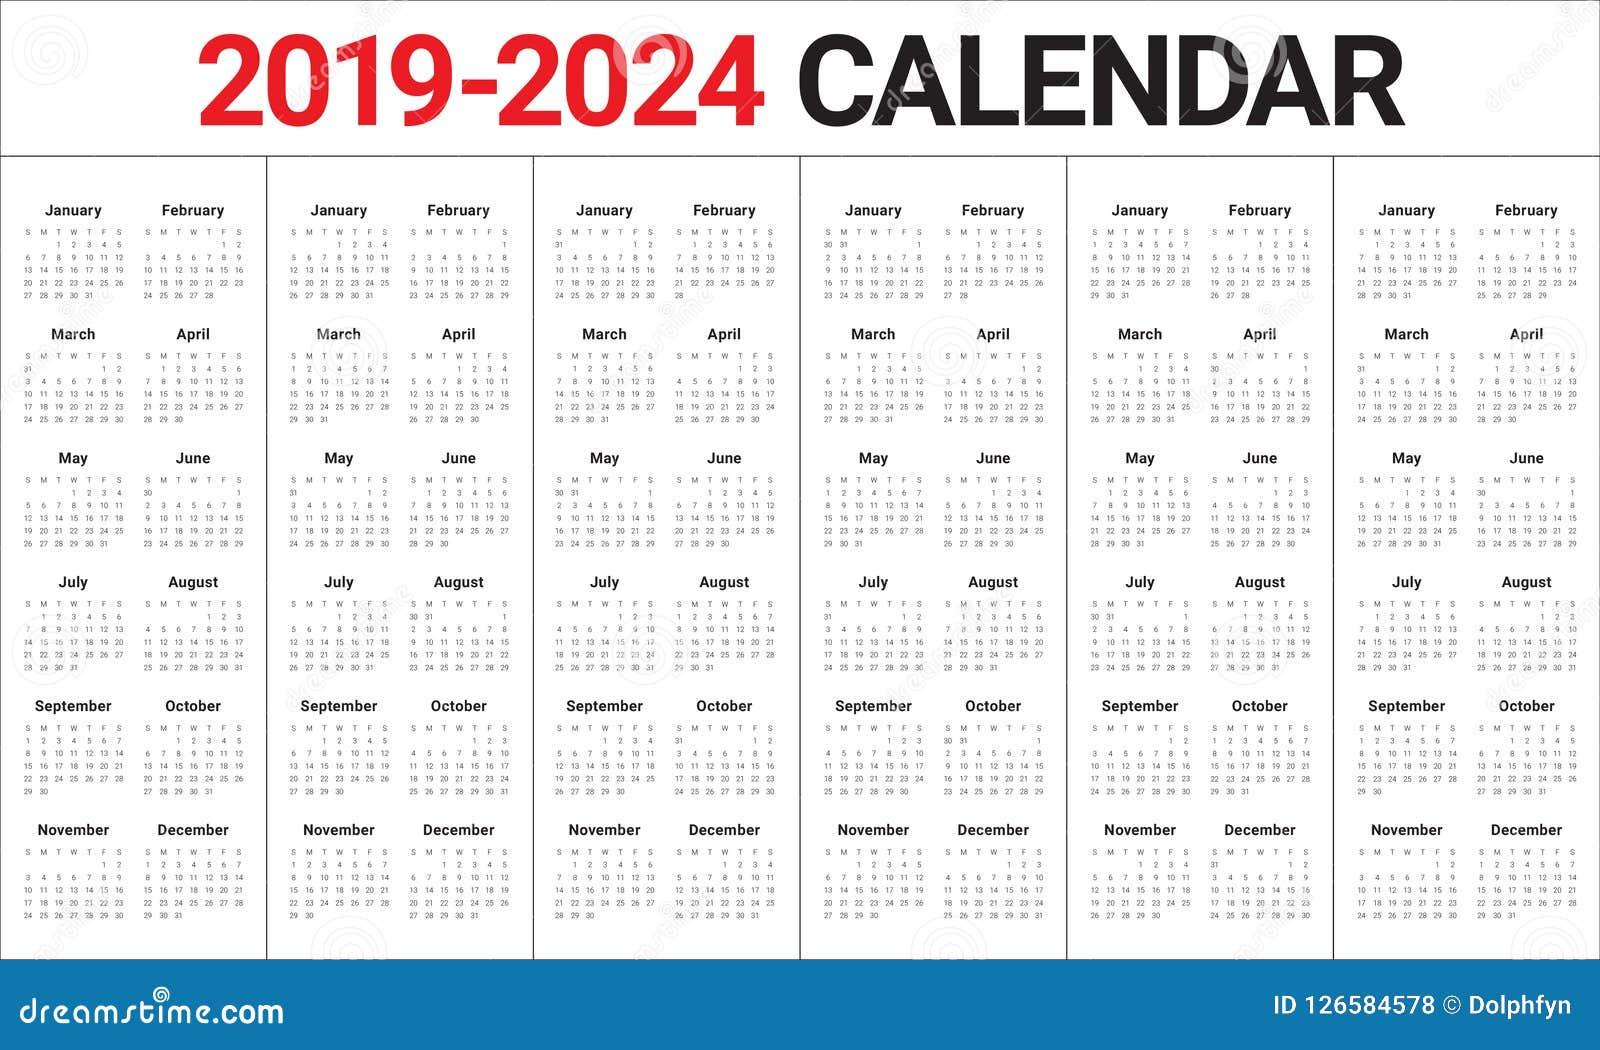 Calendrier Ramadan 2020.Annee 2019 2020 2021 2022 2023 Templa De Conception De